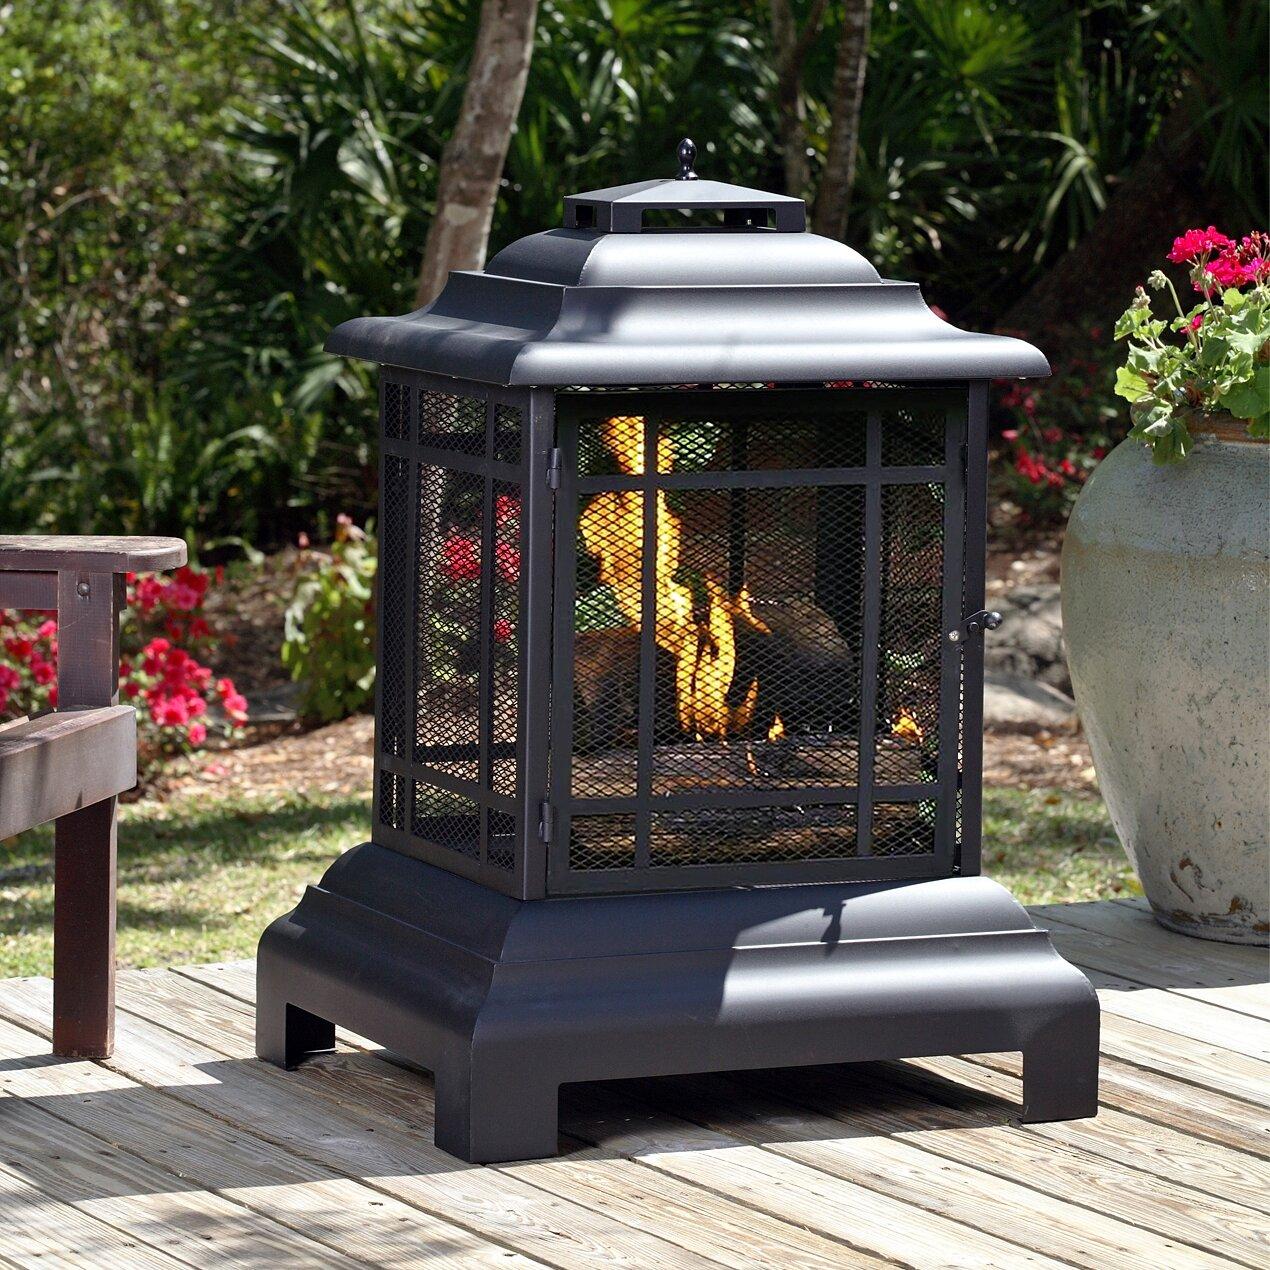 Fire Sense Patio Steel Charcoal Pagoda Reviews – Patio Fireplace